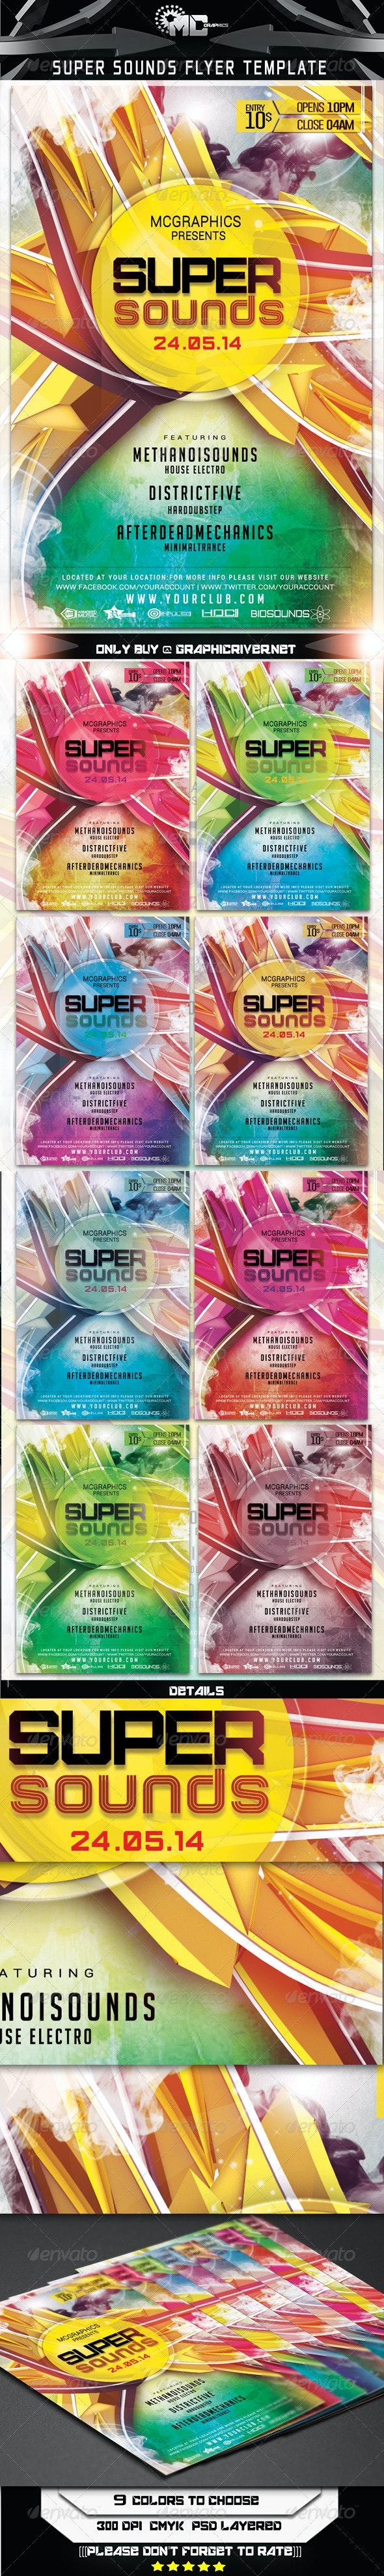 Super Sounds Flyer Template - Flyers Print Templates